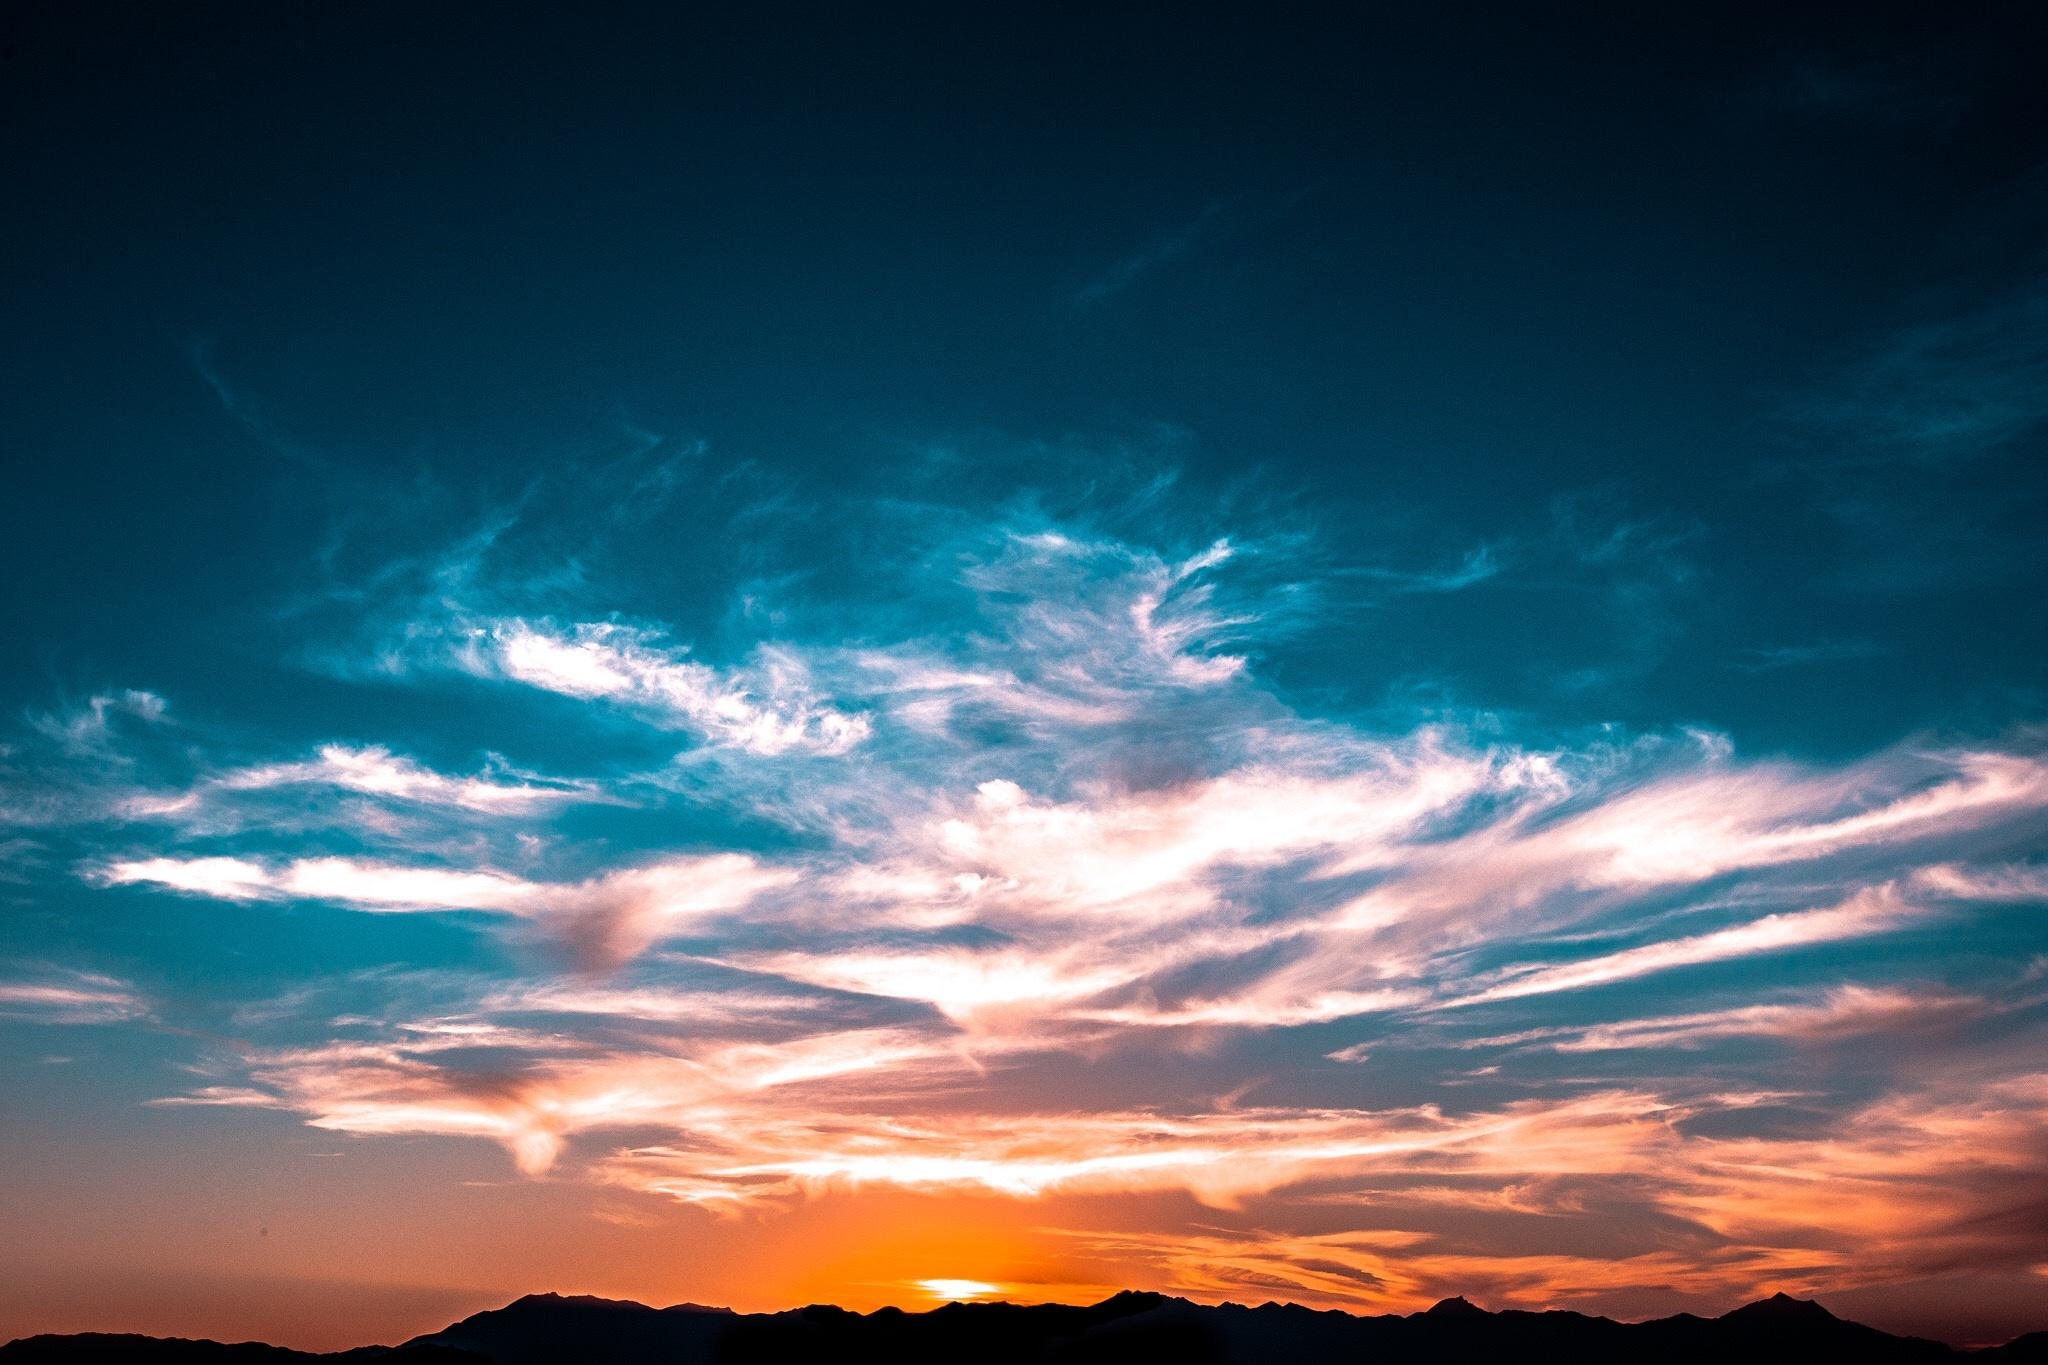 Amazing sky at sunset, light, sun, sky, clouds, sunset, colors